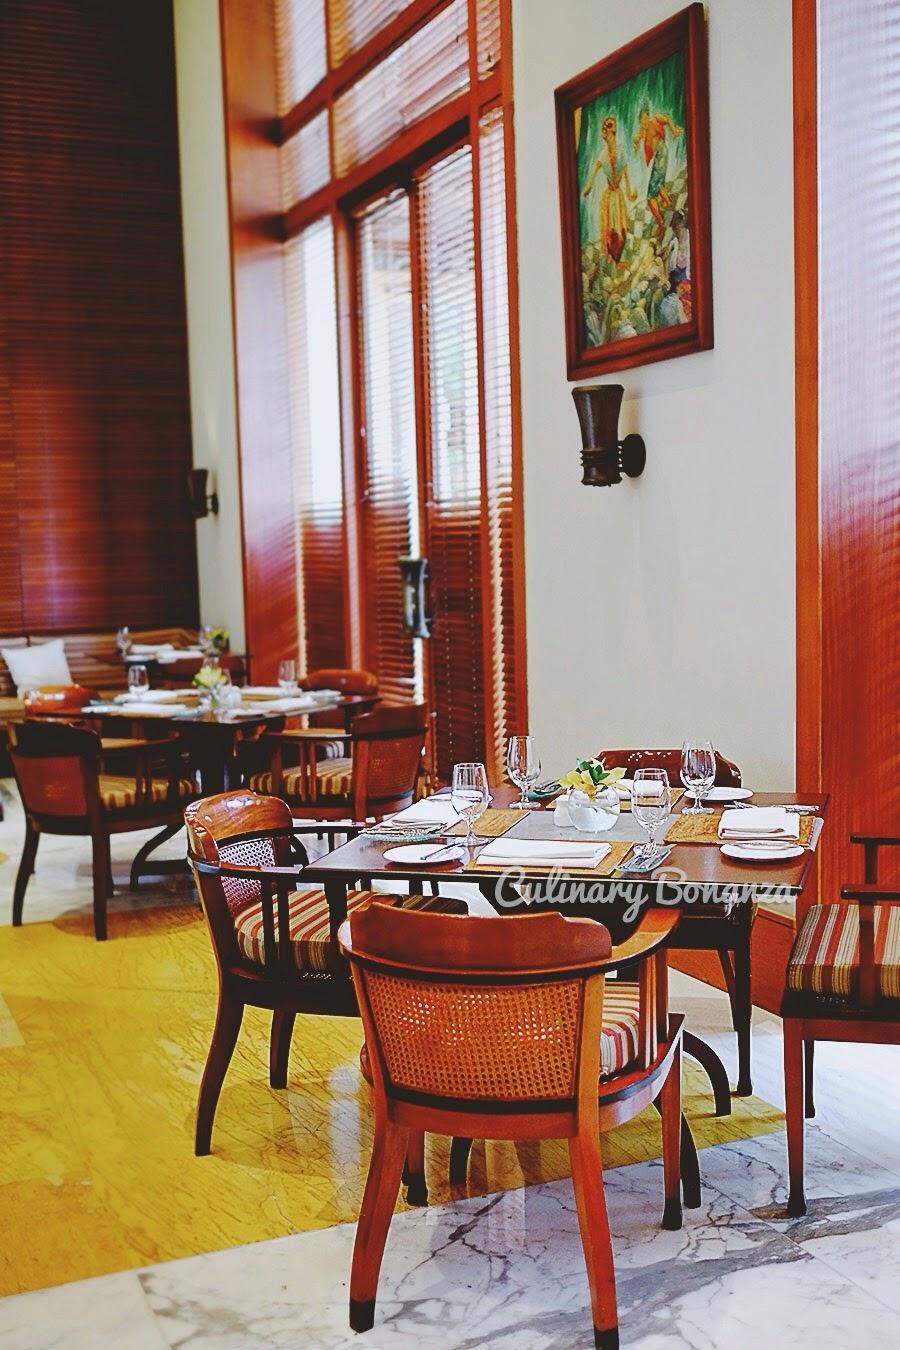 Jakarta Restaurant, The Dharmawangsa (www.culinarybonanza.com)